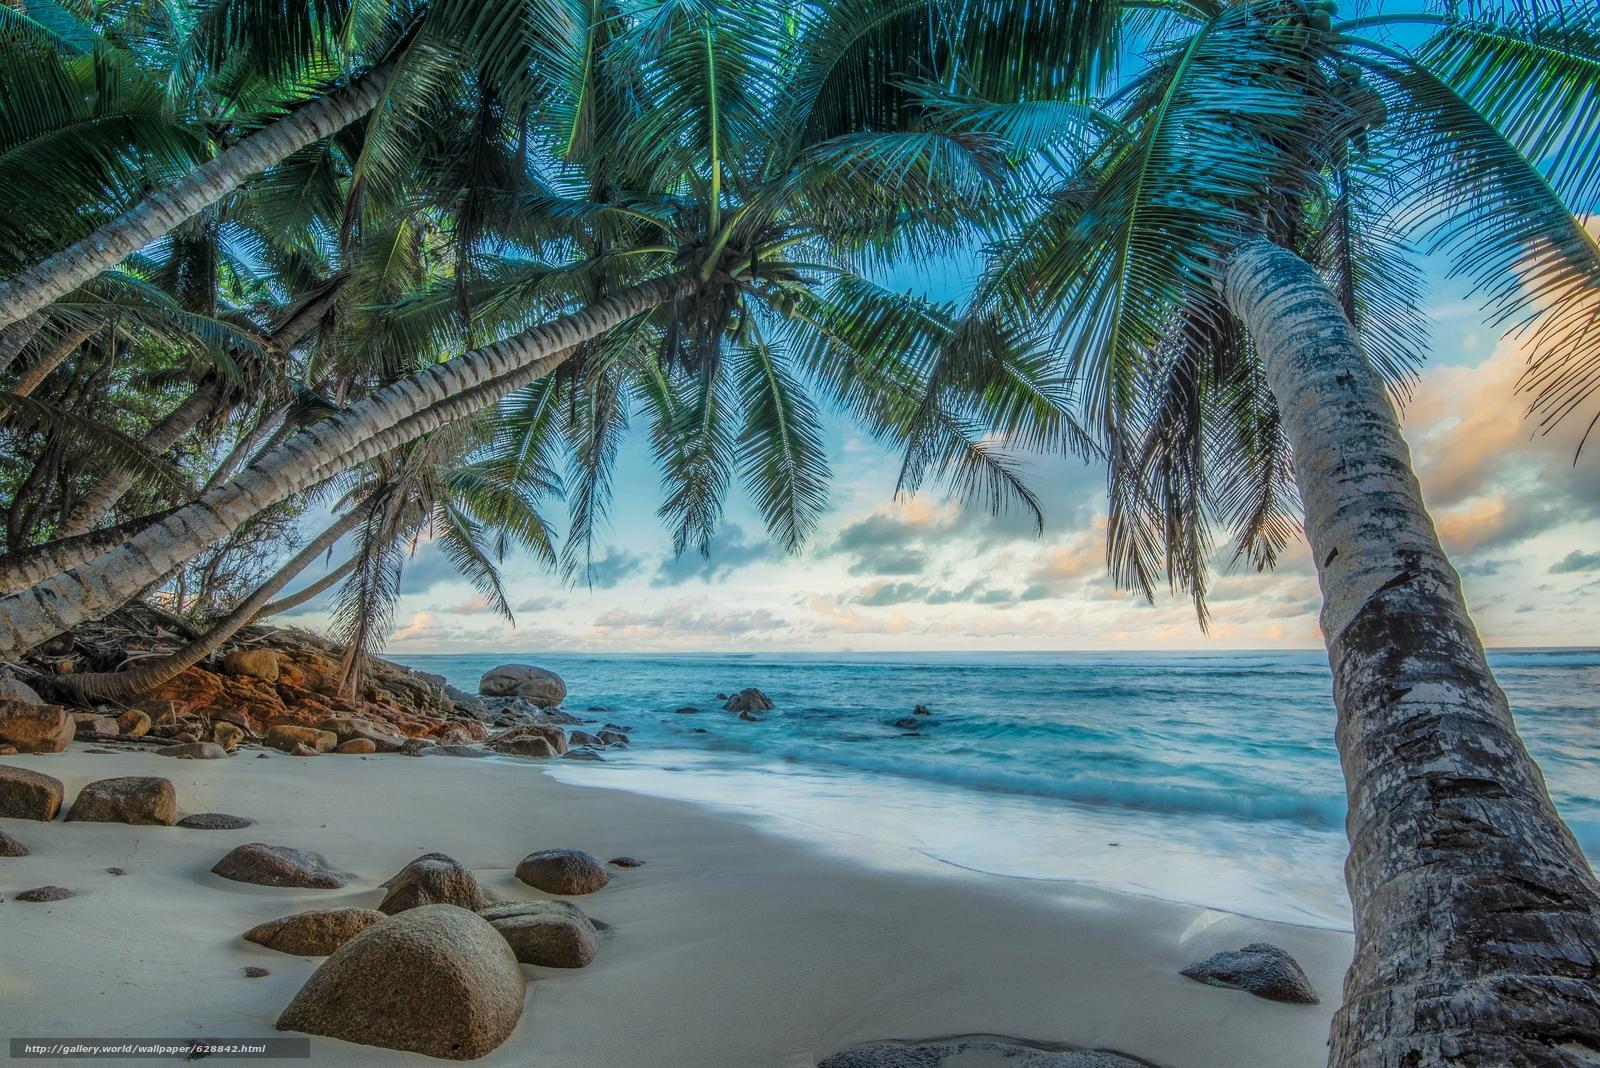 пальмы, берег, море, камни, Seychelles, пейзаж